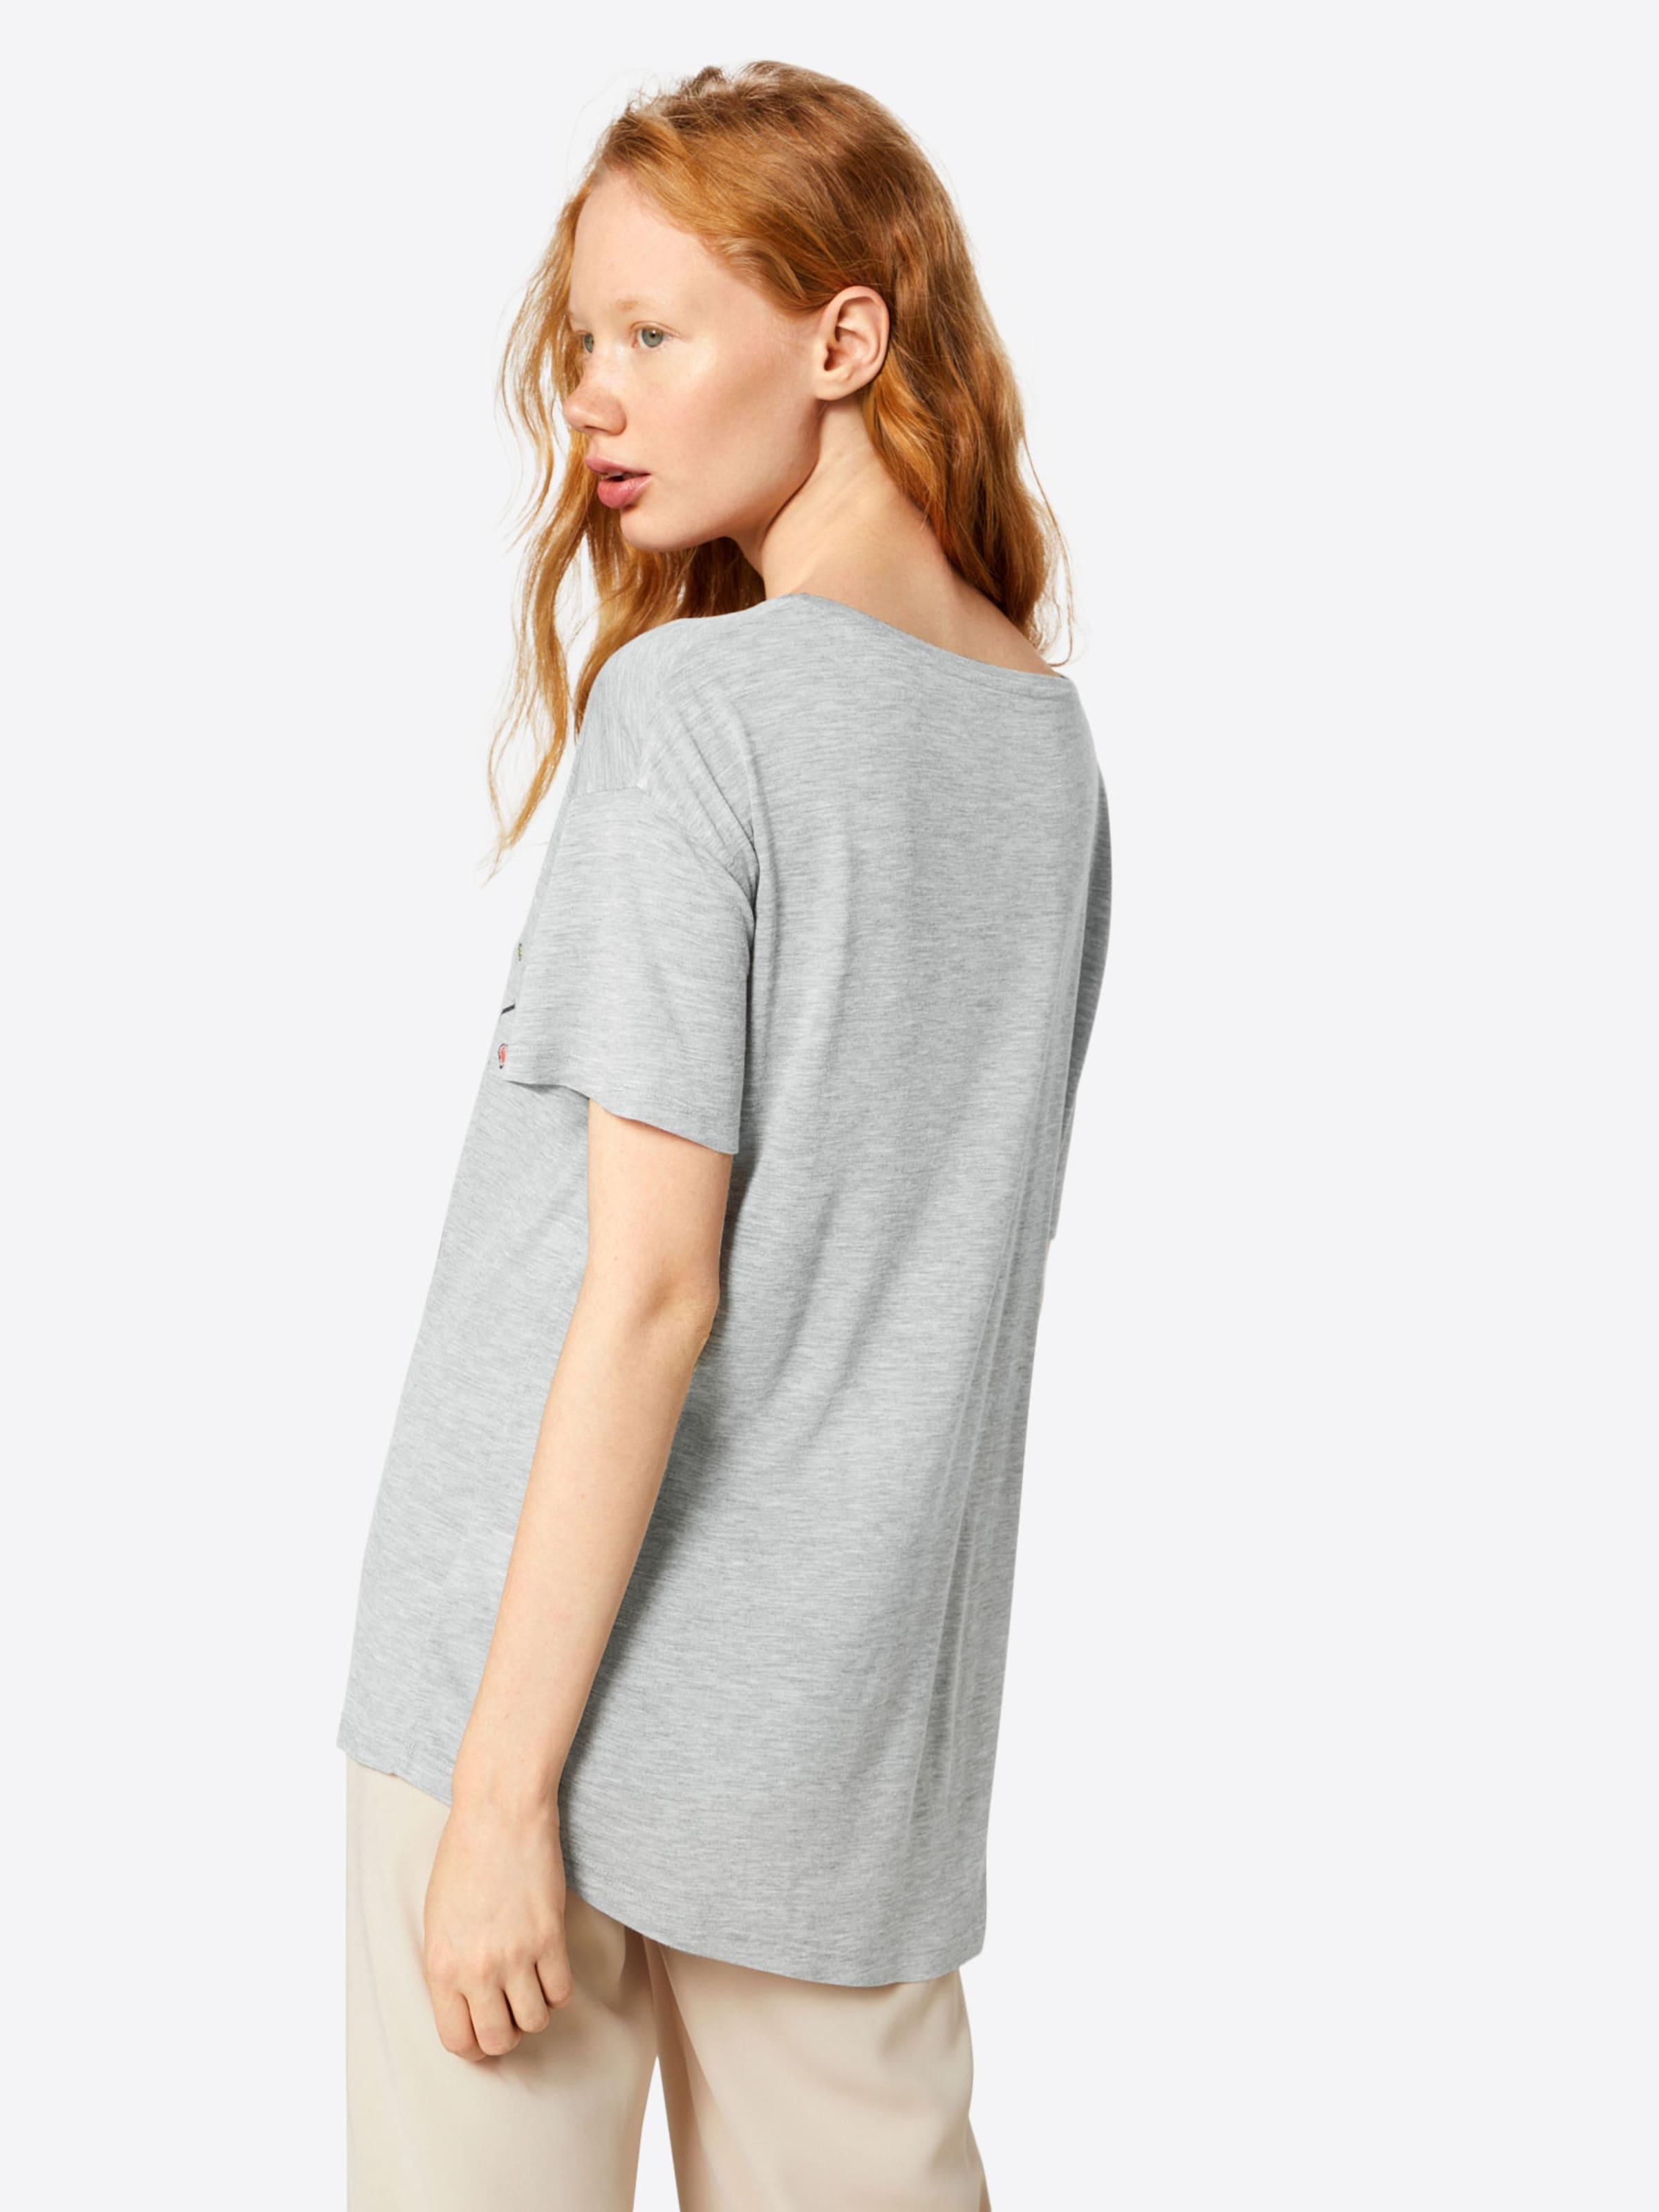 shirt T Grau In Princess Goes Hollywood 0ZnwNPkOX8